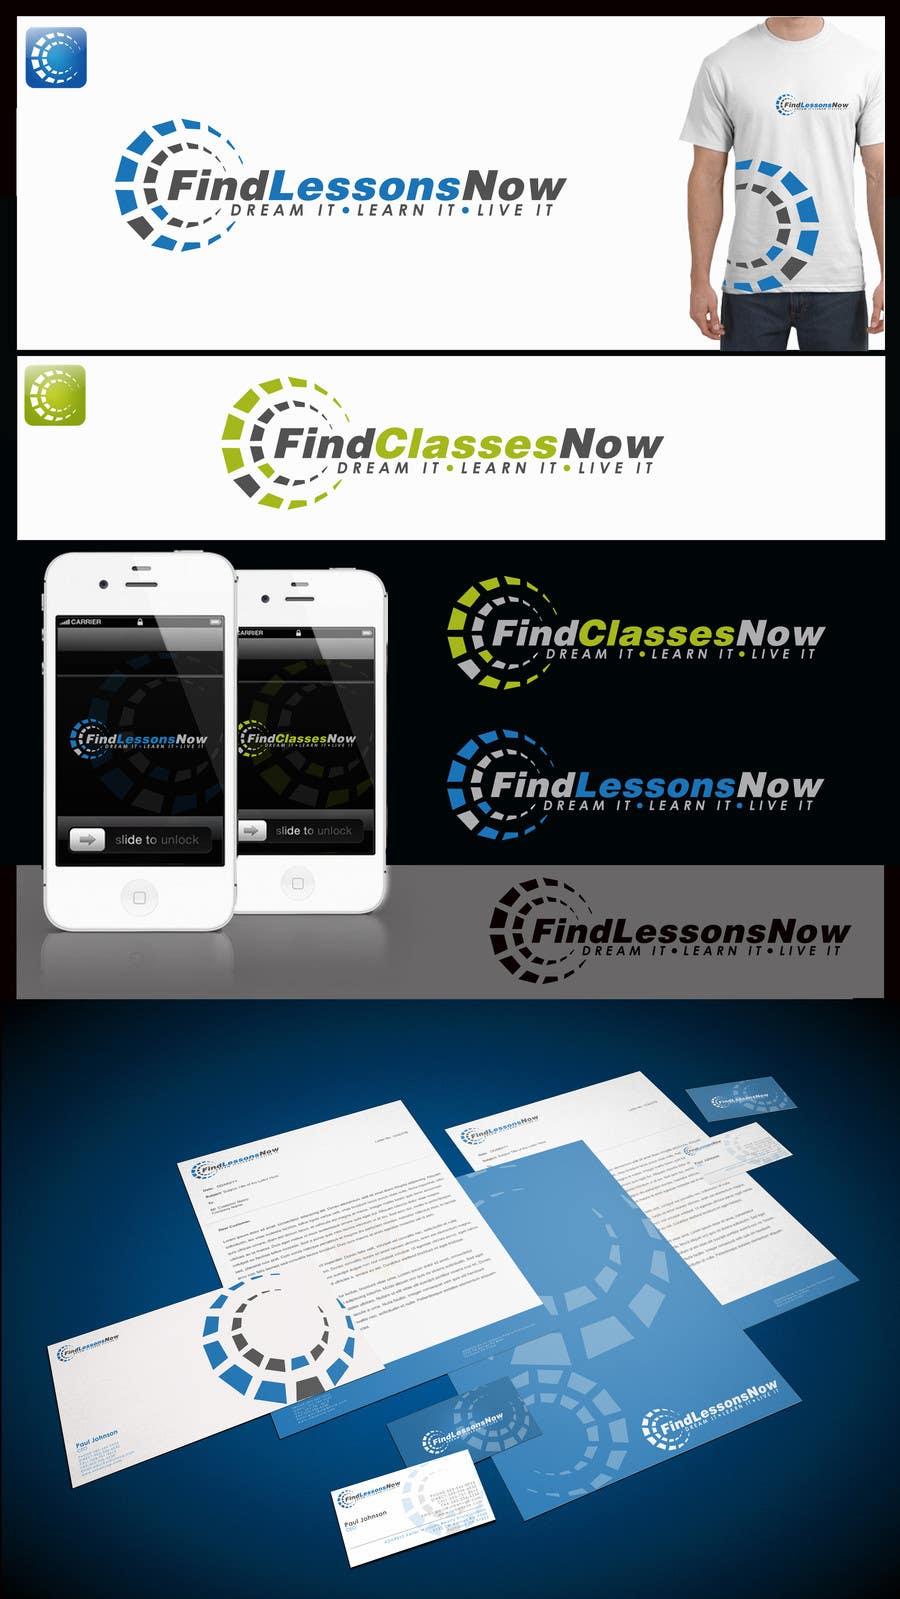 Bài tham dự cuộc thi #168 cho Logo Design for FindLessonsNow/ FindClassesNow